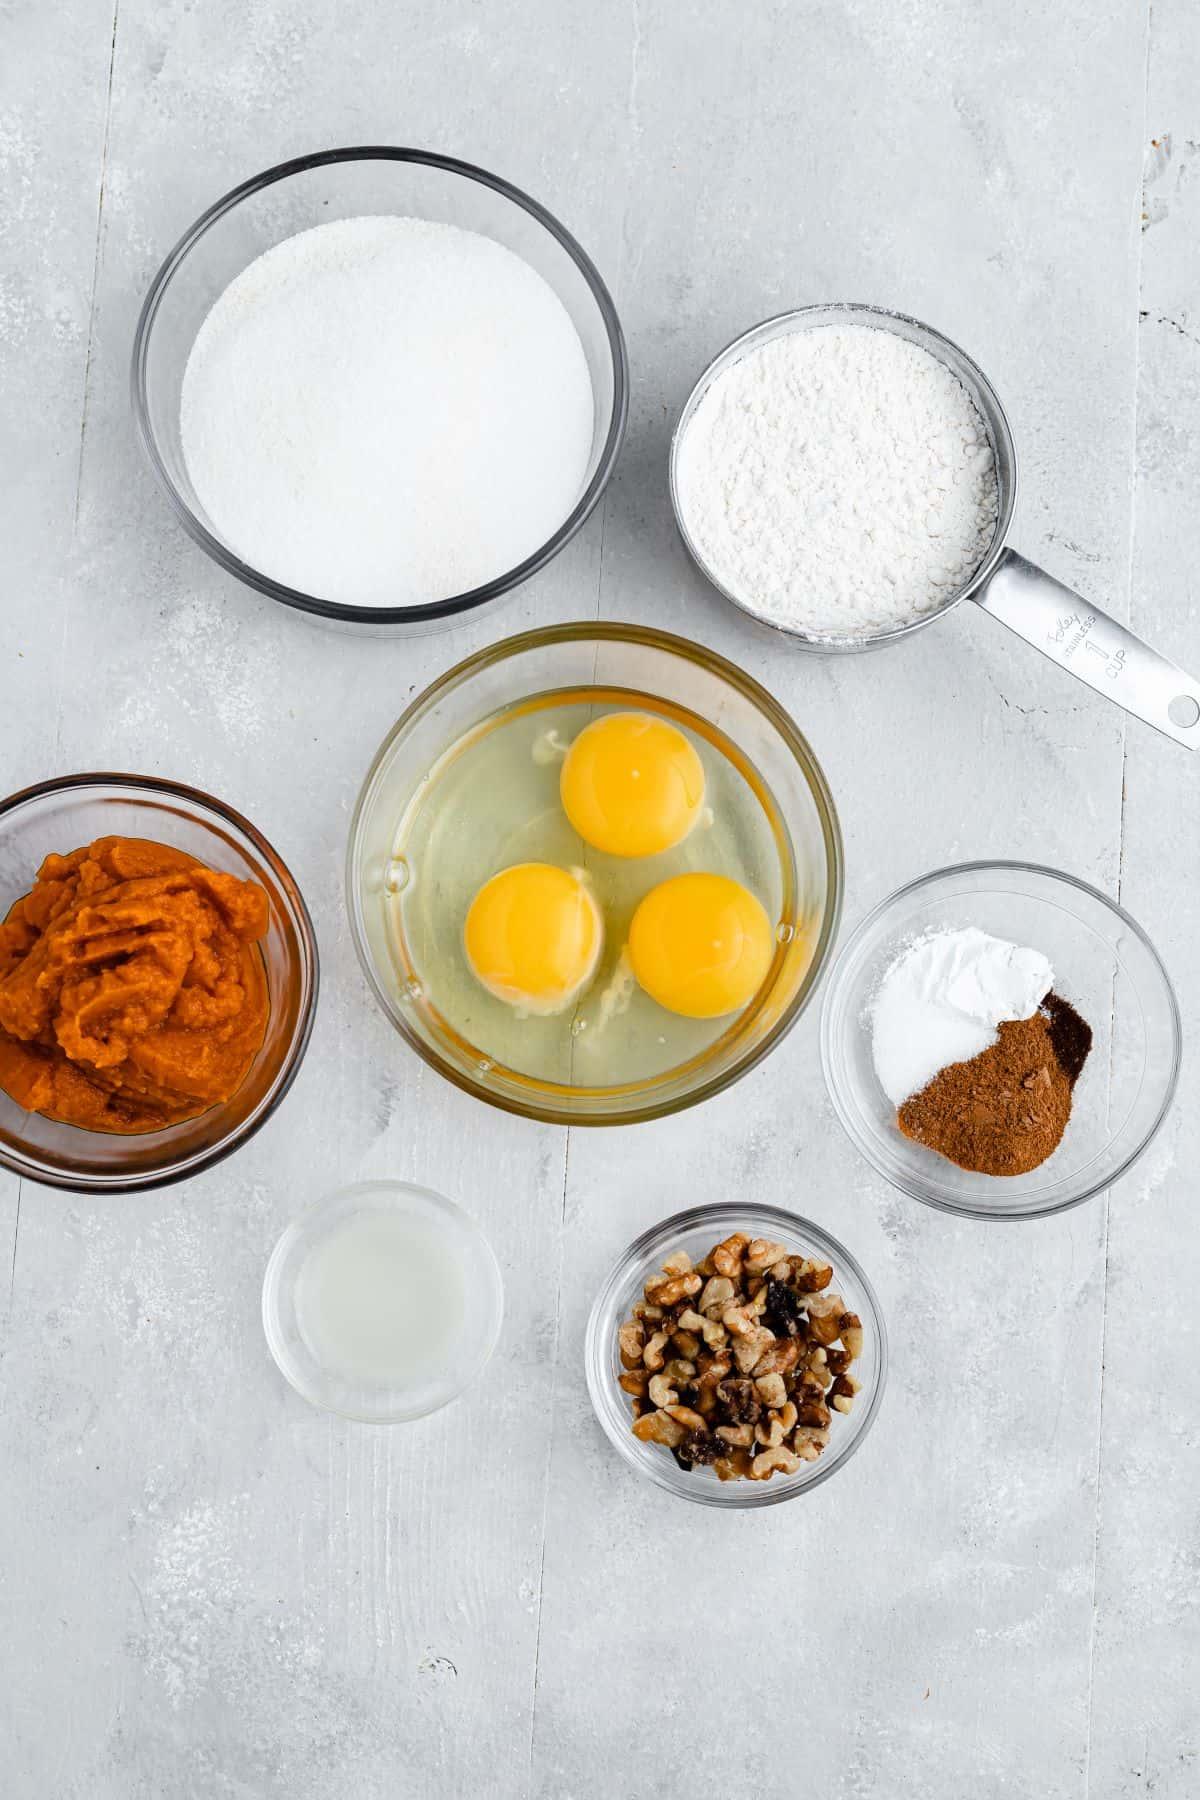 Clockwise from top: flour, spices, walnuts, lemon juice, pumpkin puree, sugar. Center: 3 eggs.